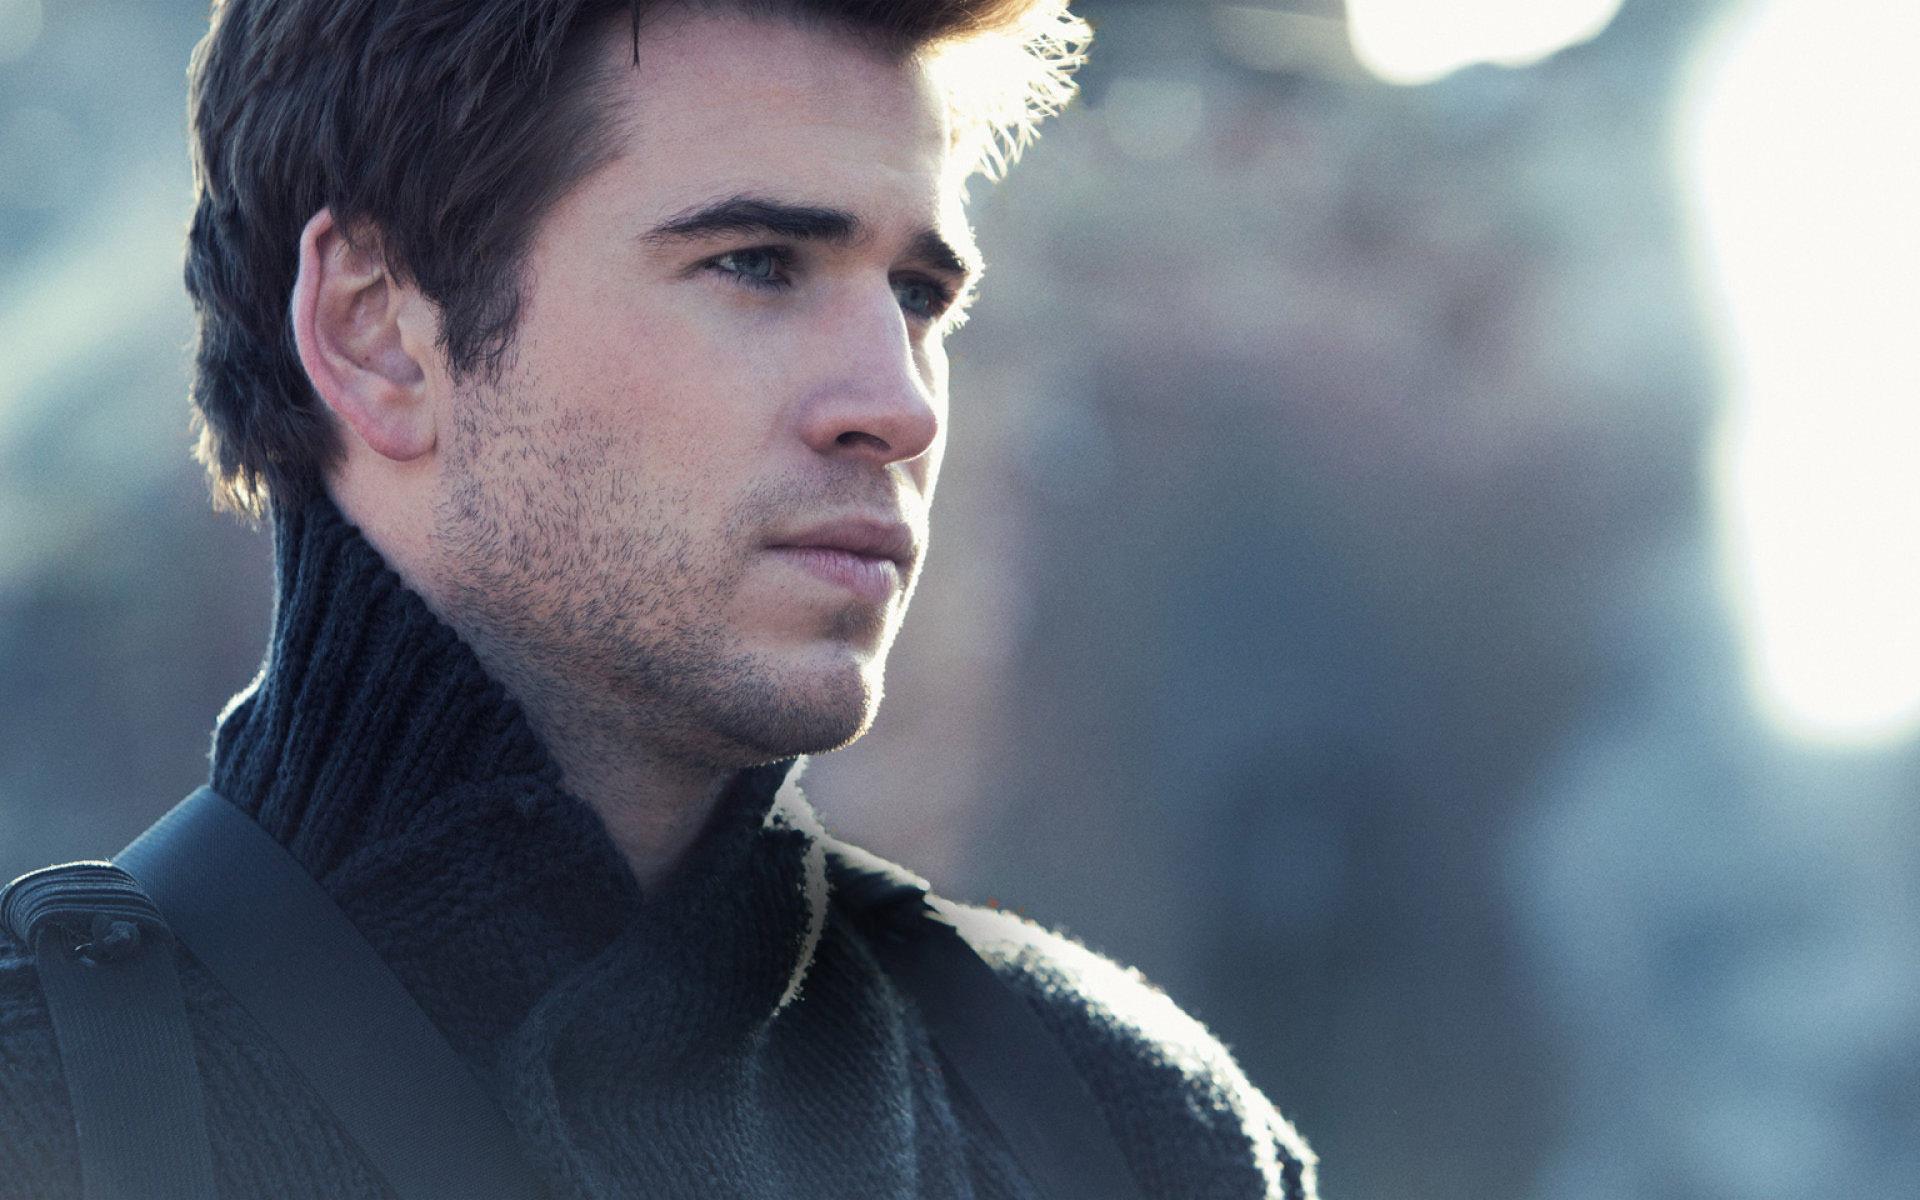 Liam Hemsworth Wallpaper